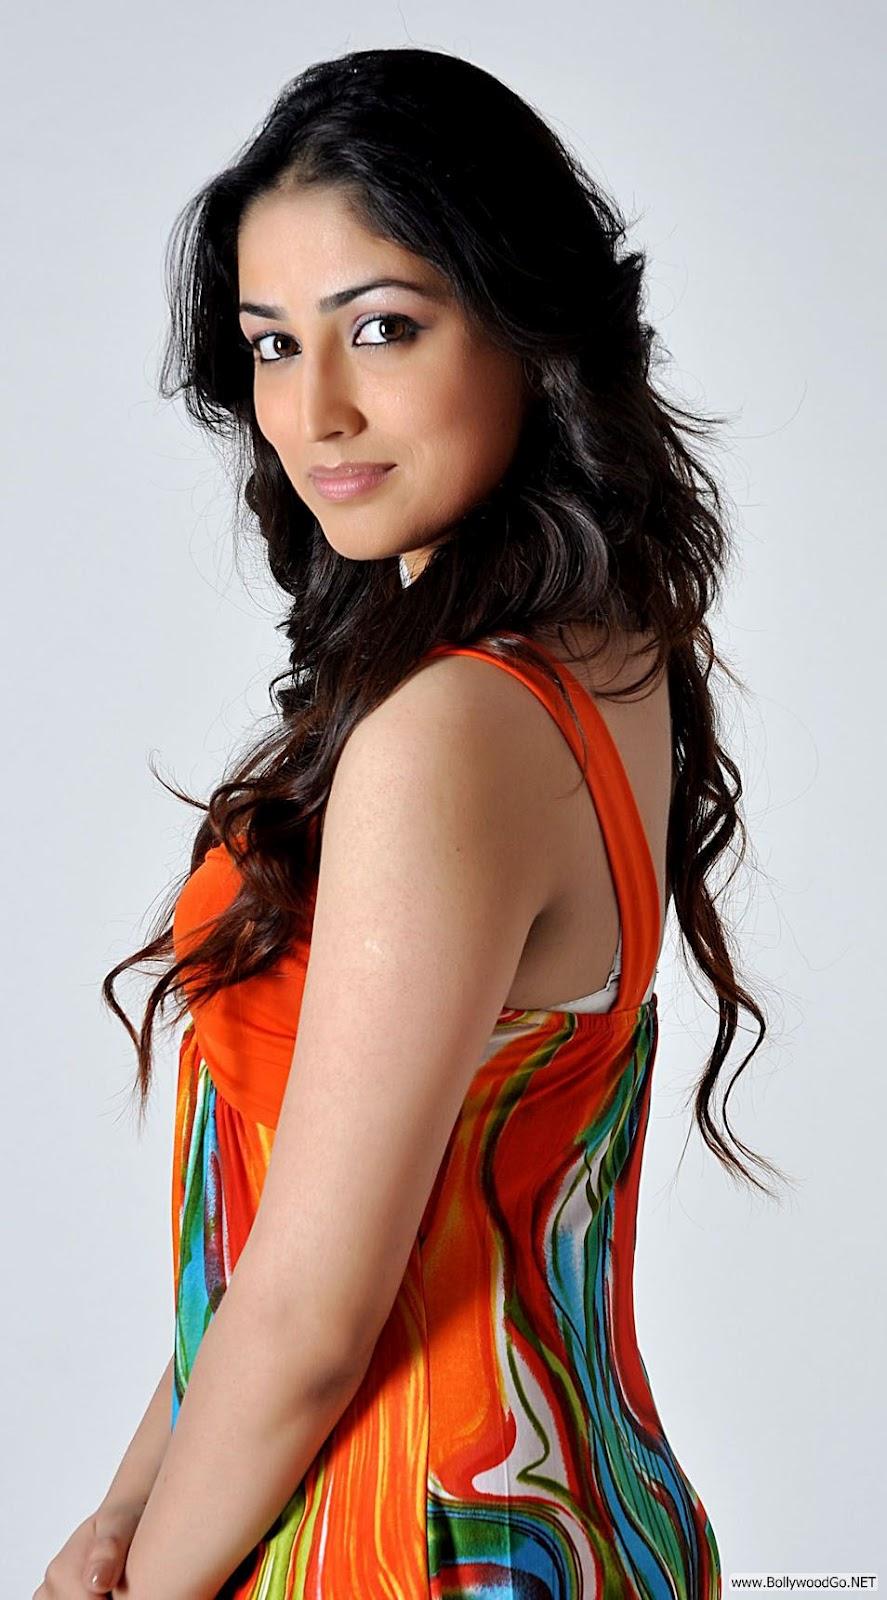 http://4.bp.blogspot.com/-OX1Z_DzPi_k/UFGK5iUQktI/AAAAAAAAeeQ/XLwKmZmh8po/s1600/Yami+Gautam+-+BollywoodGo+%285%29.jpg